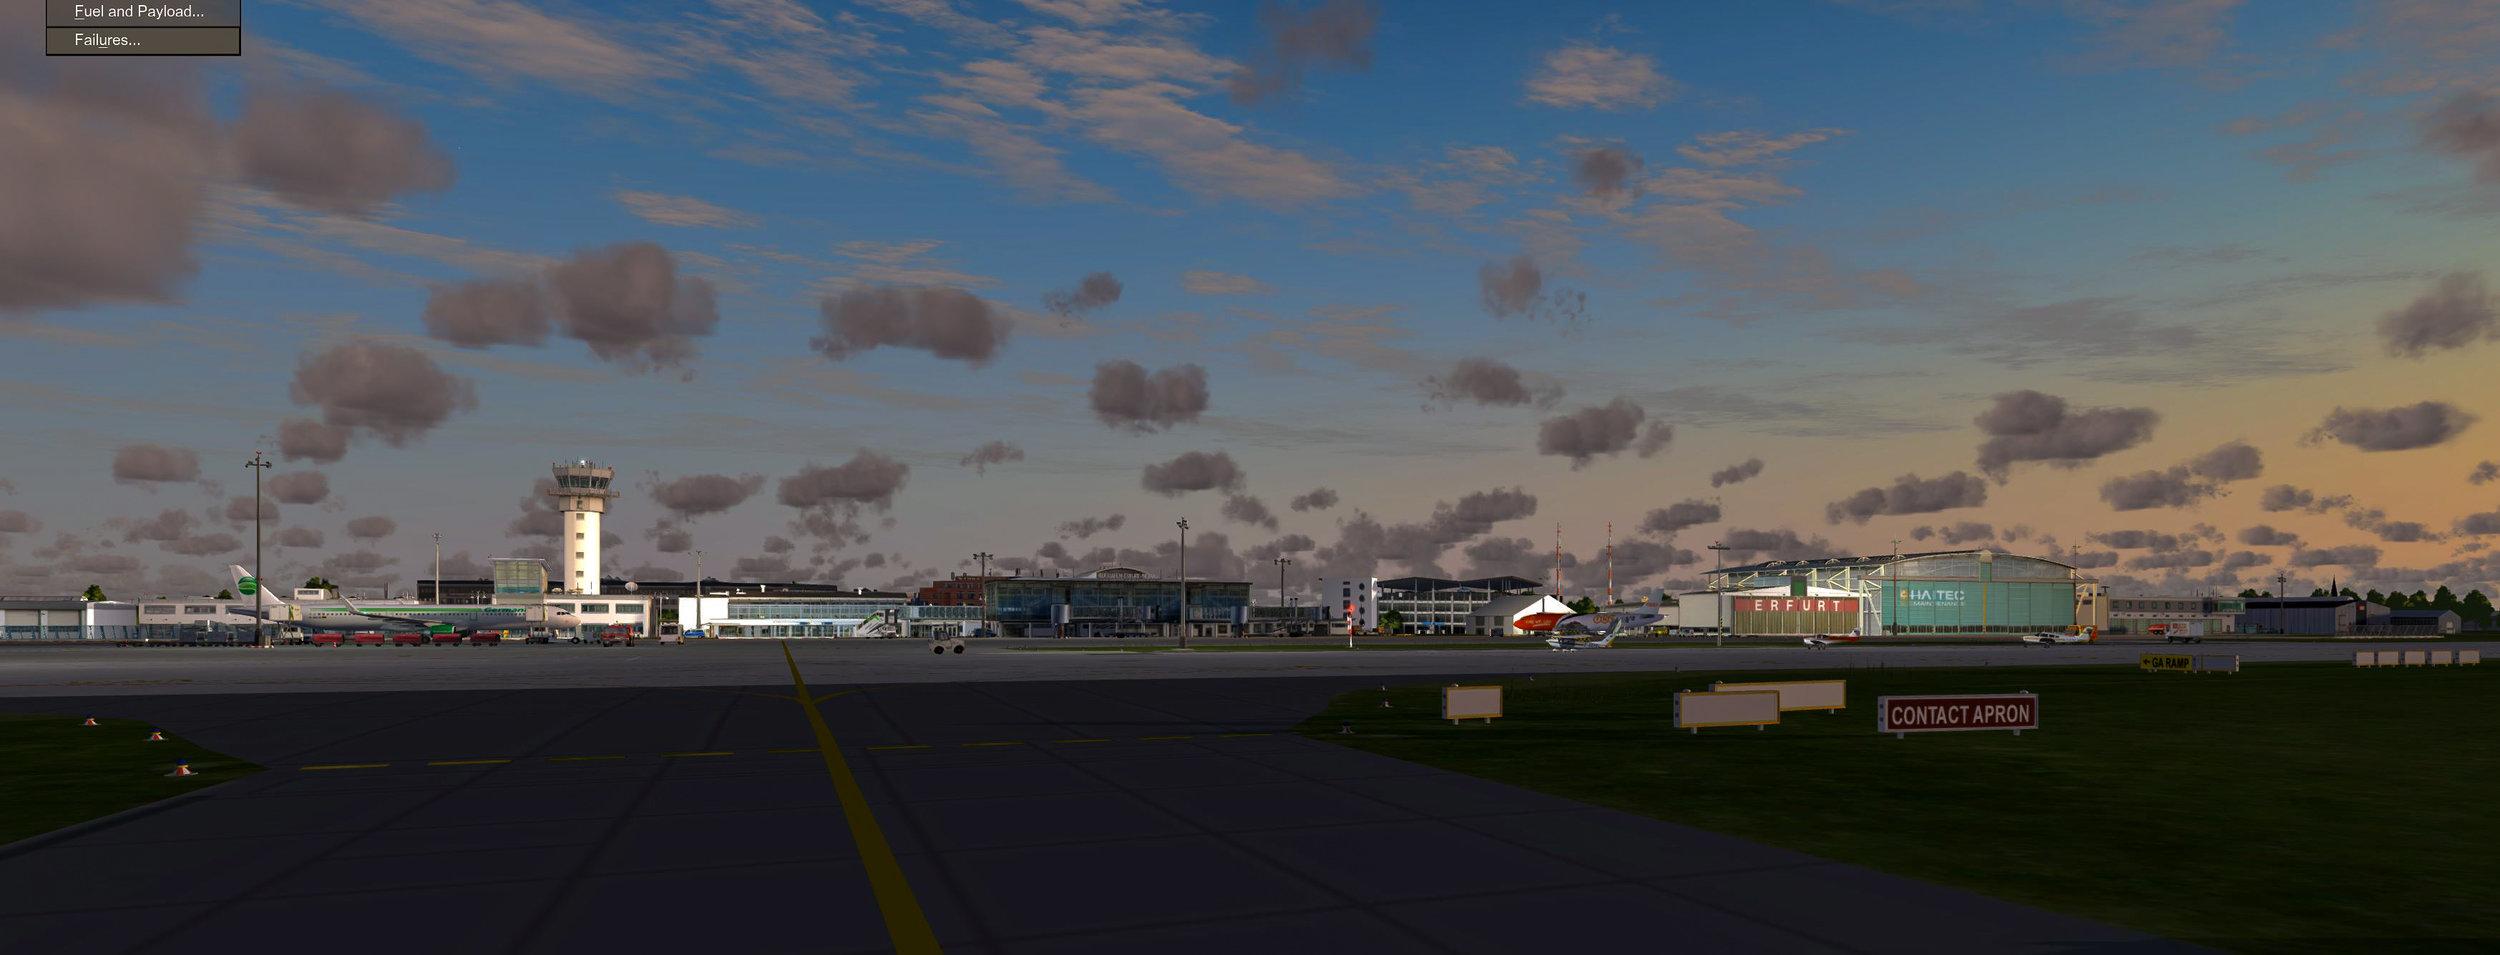 Airport_Erfurt_P3Dv4_16.jpg